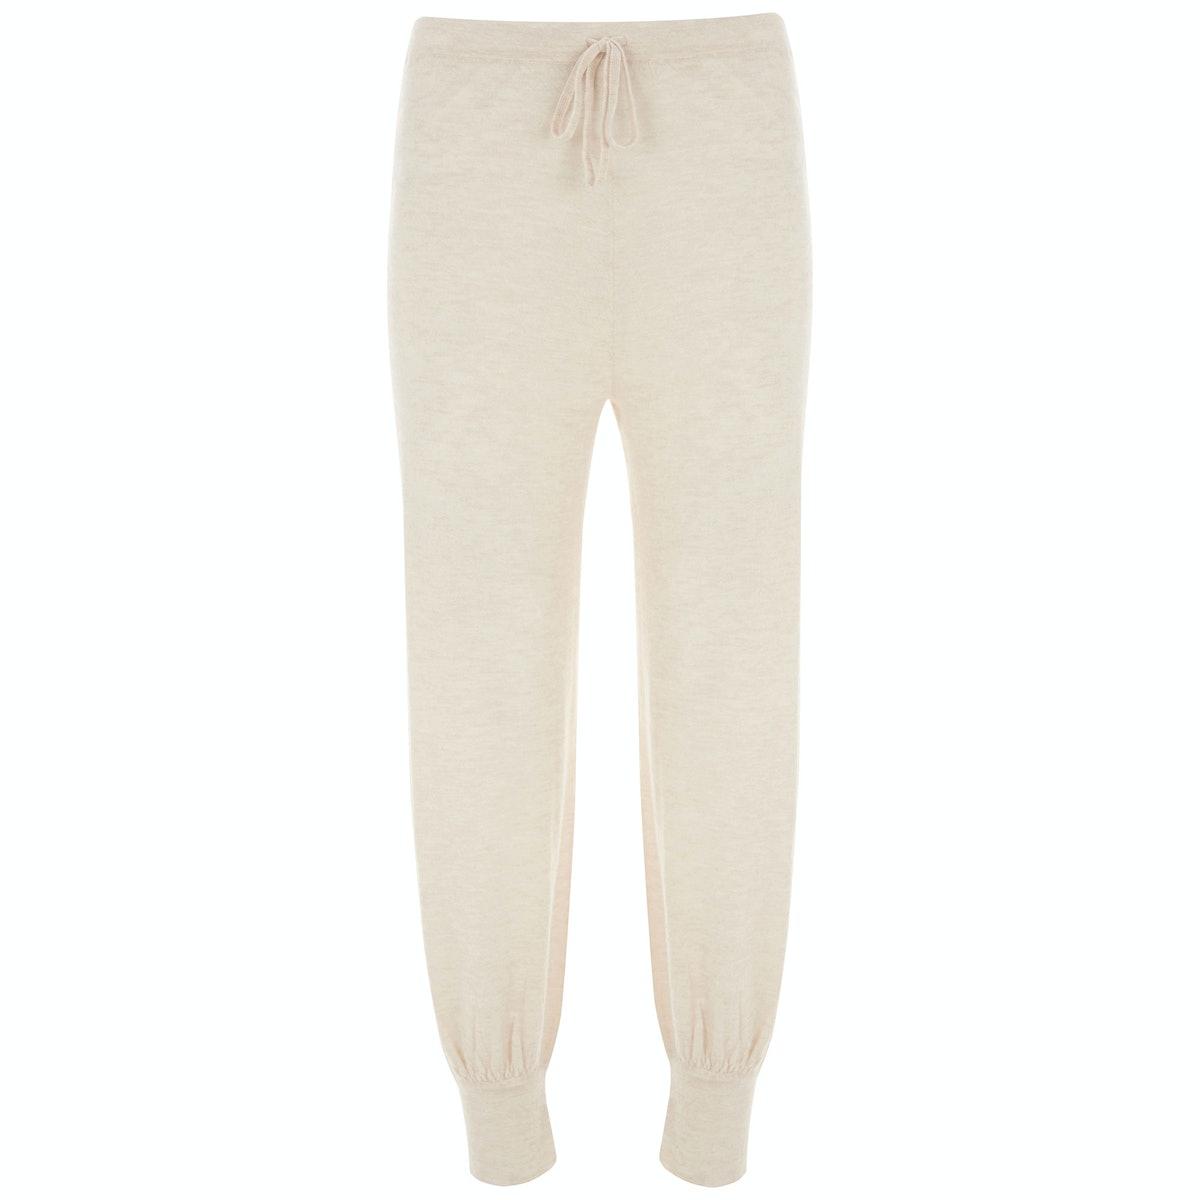 Madeleine Thompson pants